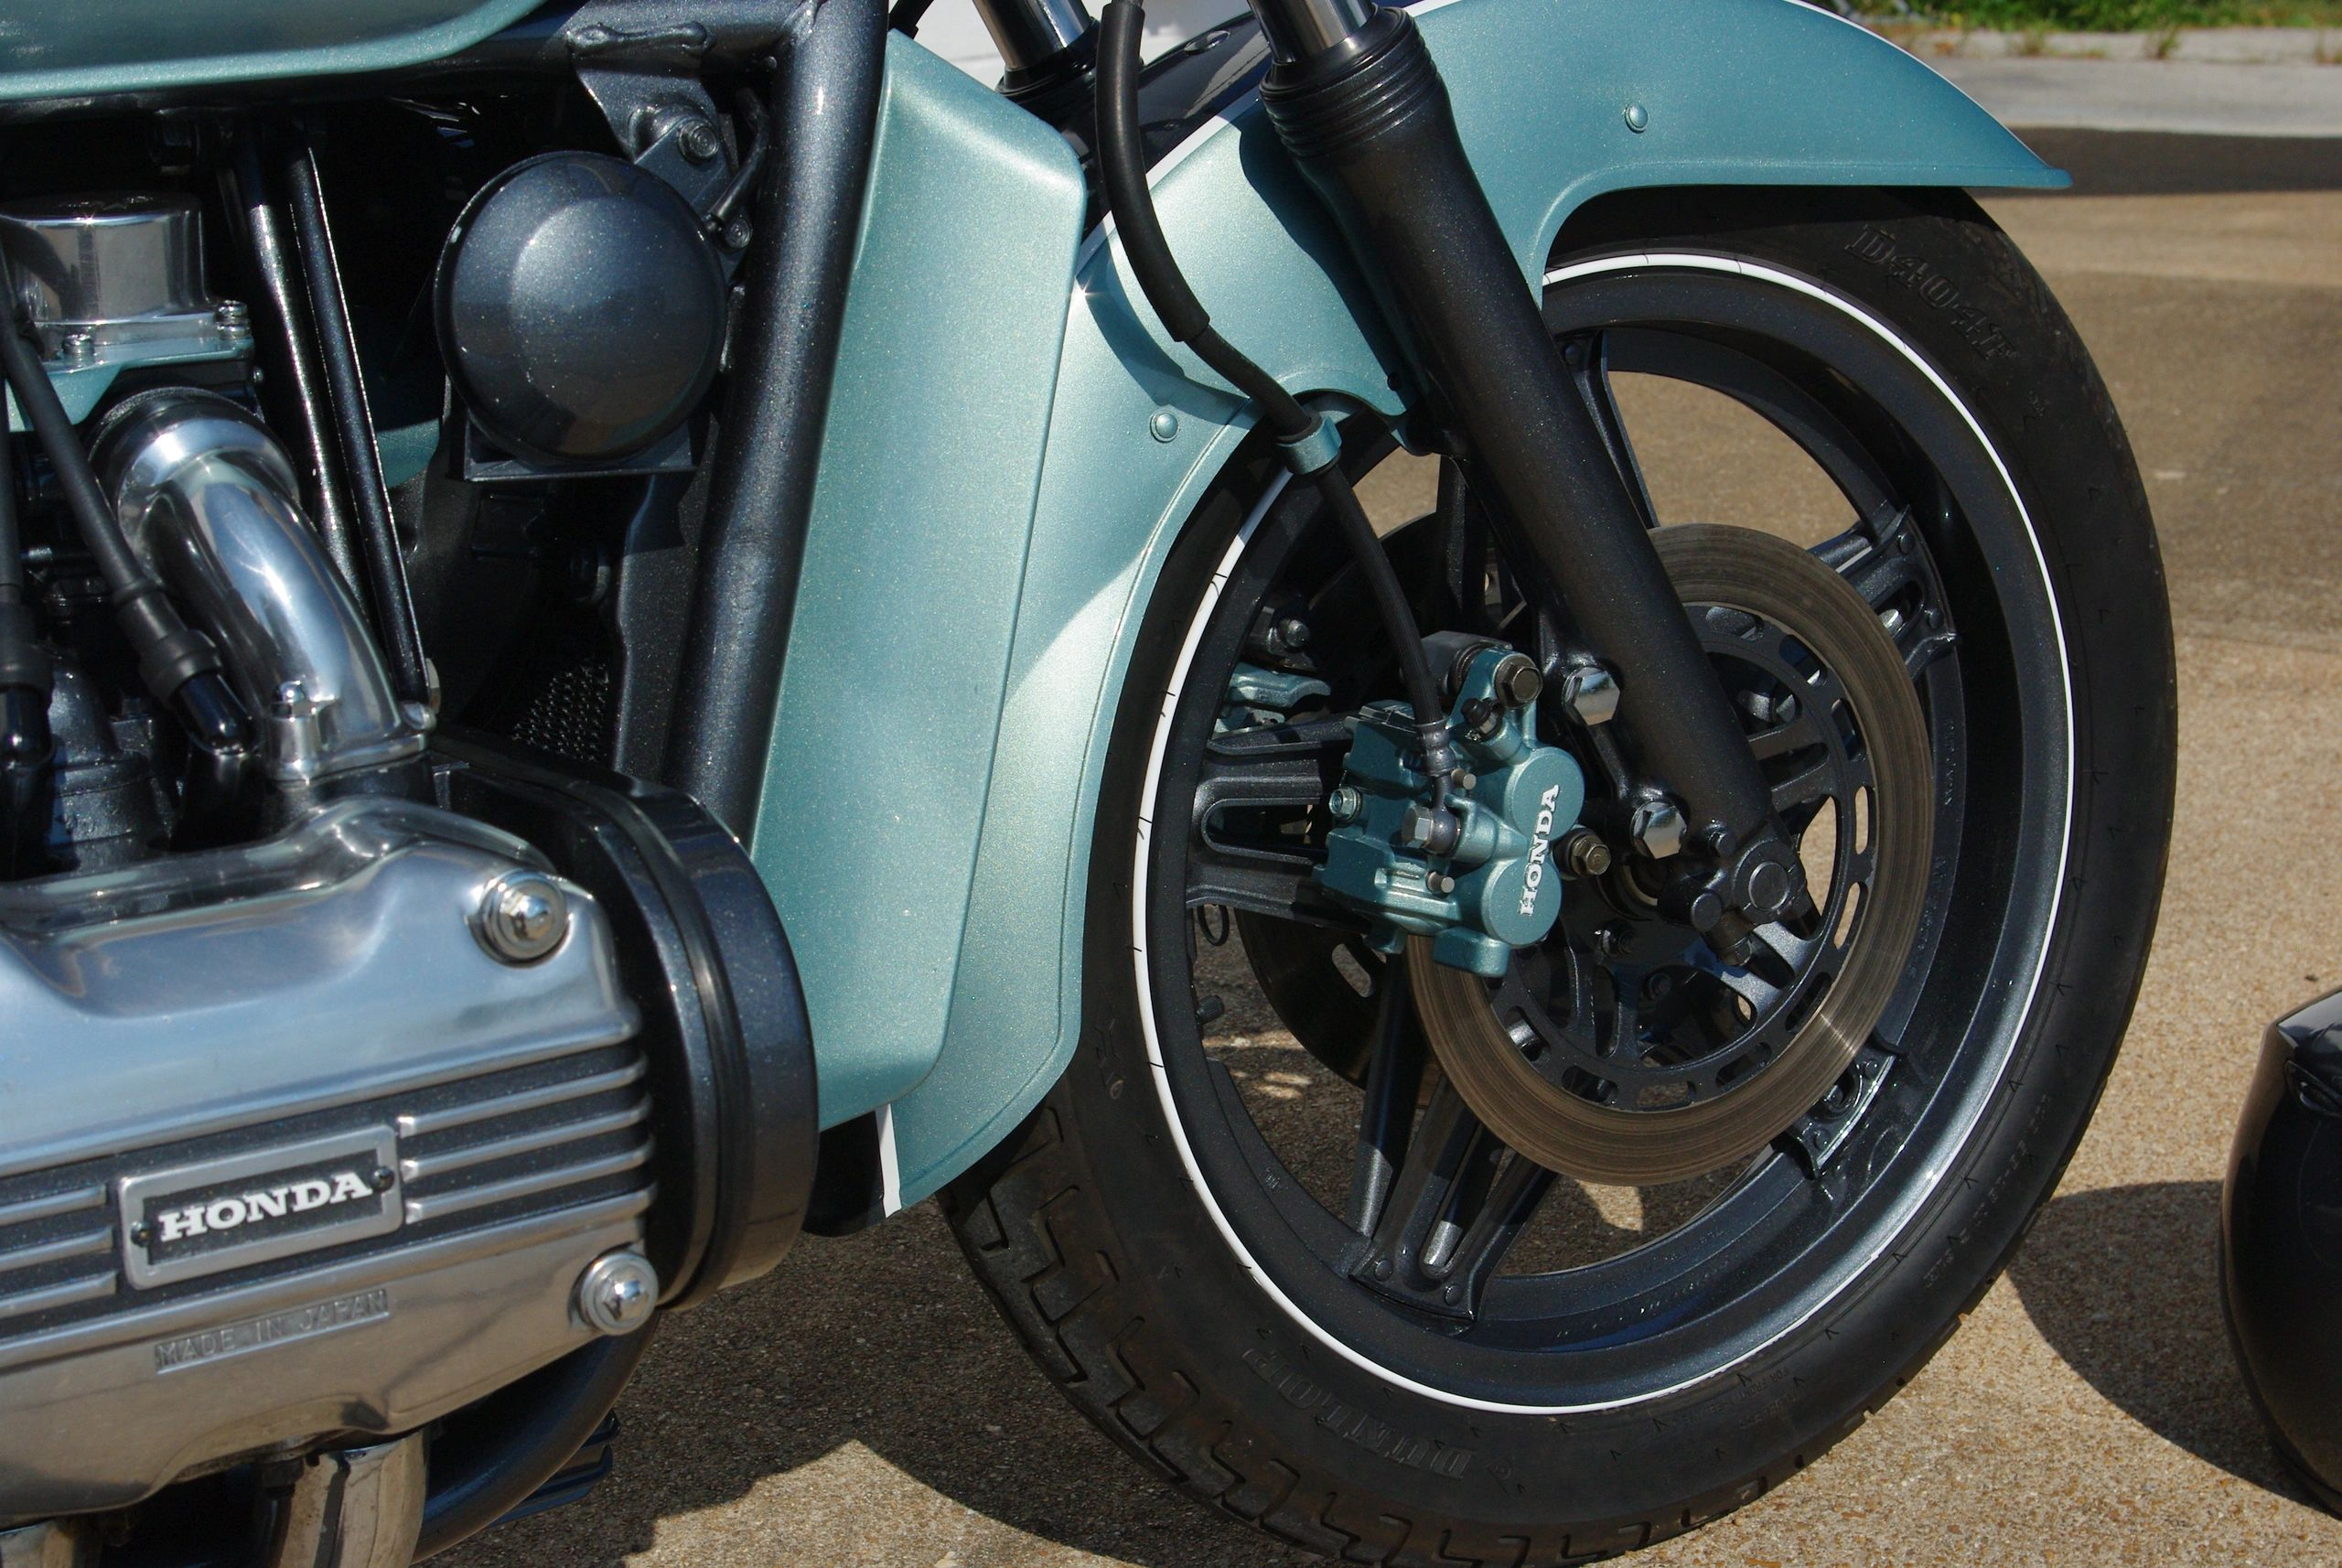 2017 2018 Projects Grubbs Garage Metric Motorcycles 1970 Honda Ct70 Fuel Tank